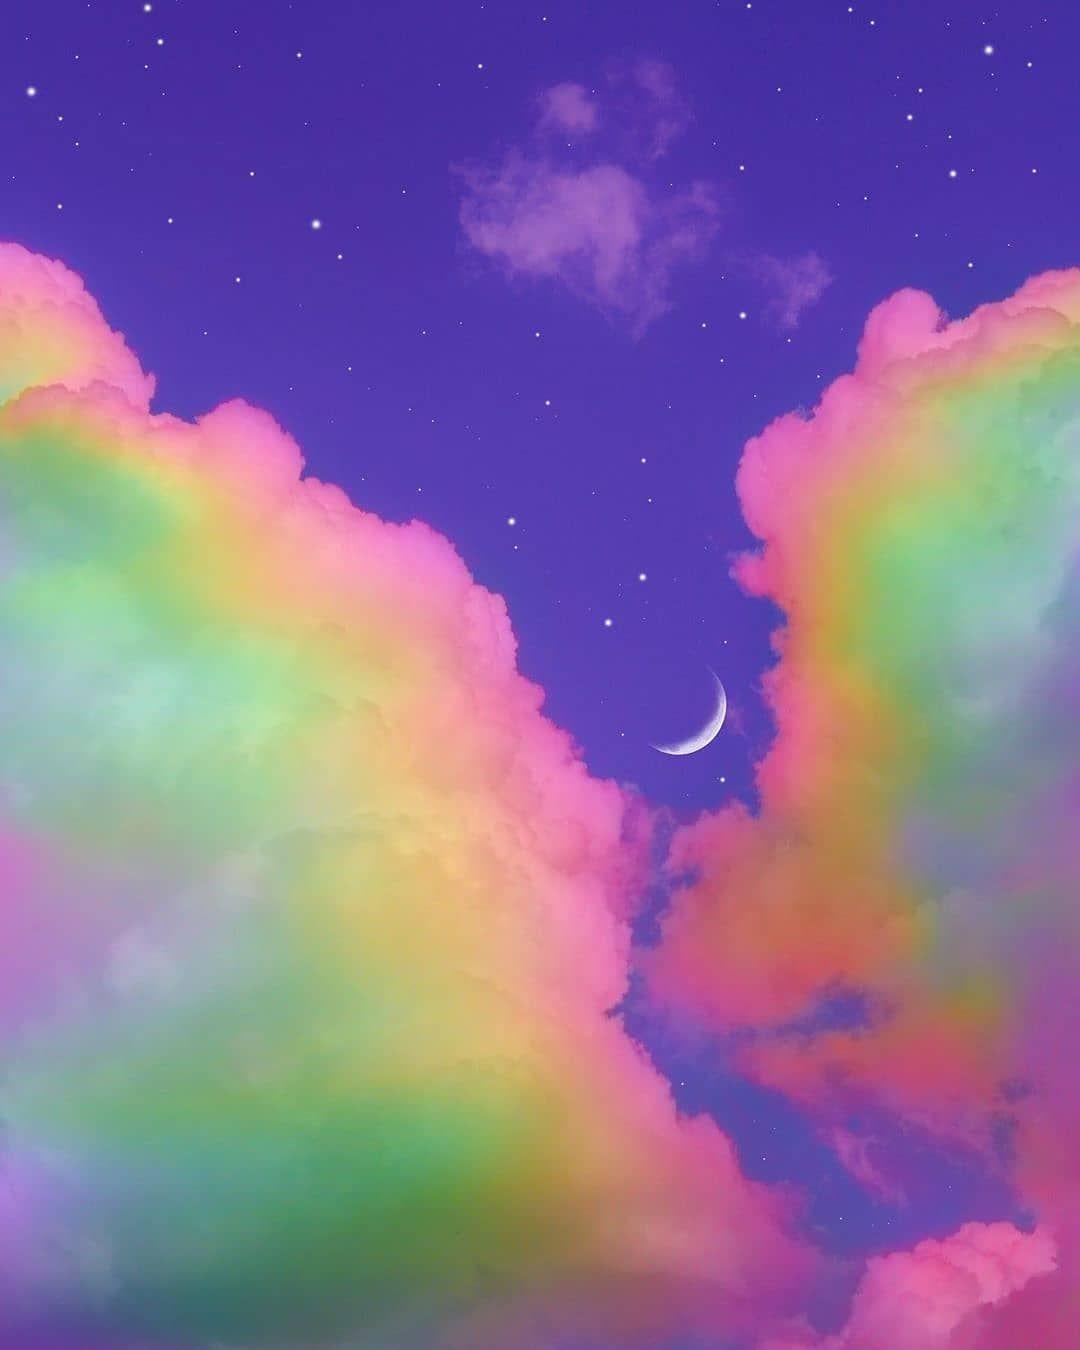 Aesthetics On Instagram Follow Lofi Aesthetics For More Pics Like This Credits Y Rainbow Aesthetic Rainbow Wallpaper Art Collage Wall